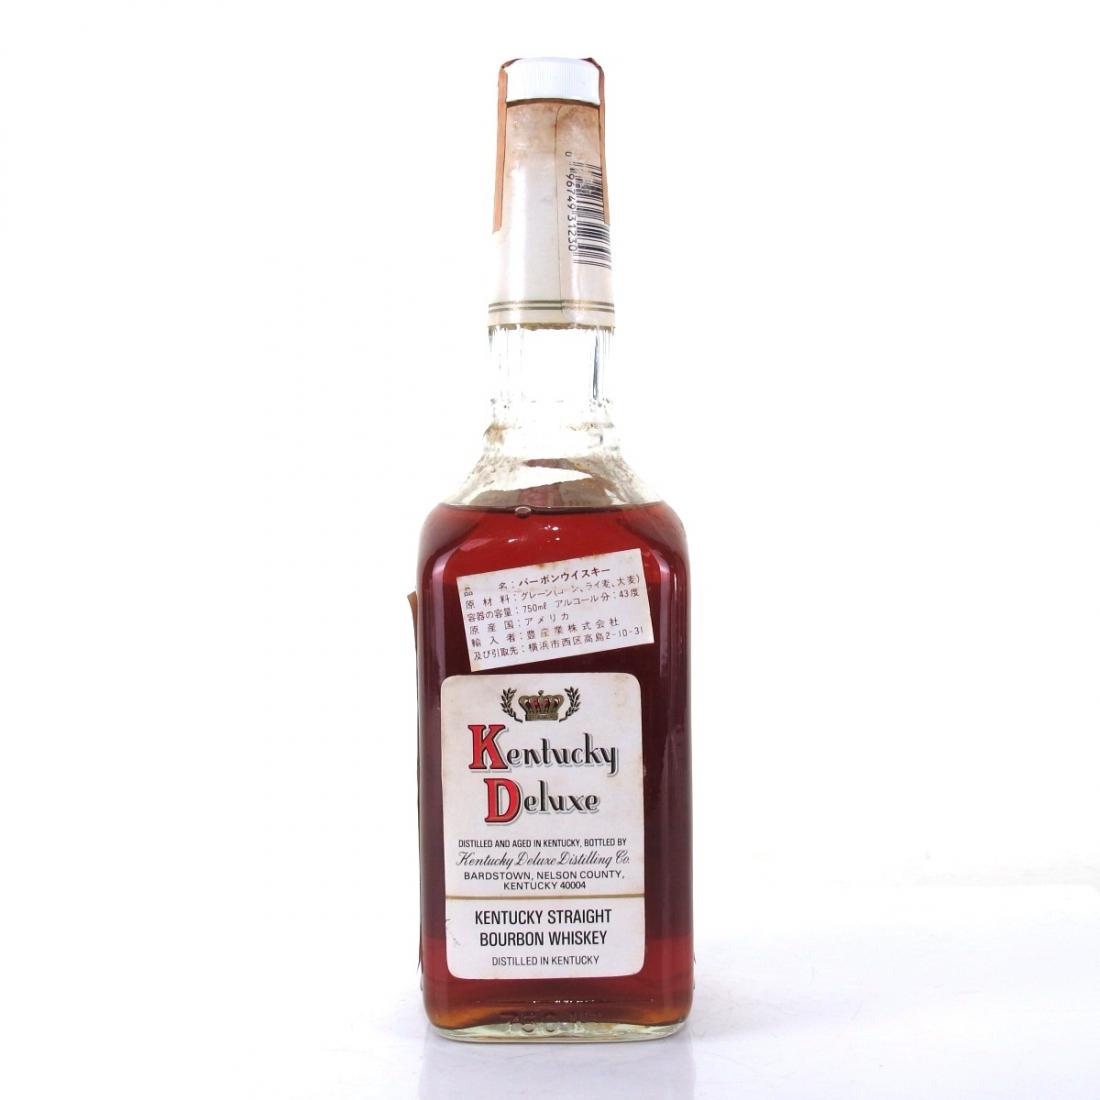 Kentucky Deluxe 12 Year Old Kentucky Bourbon